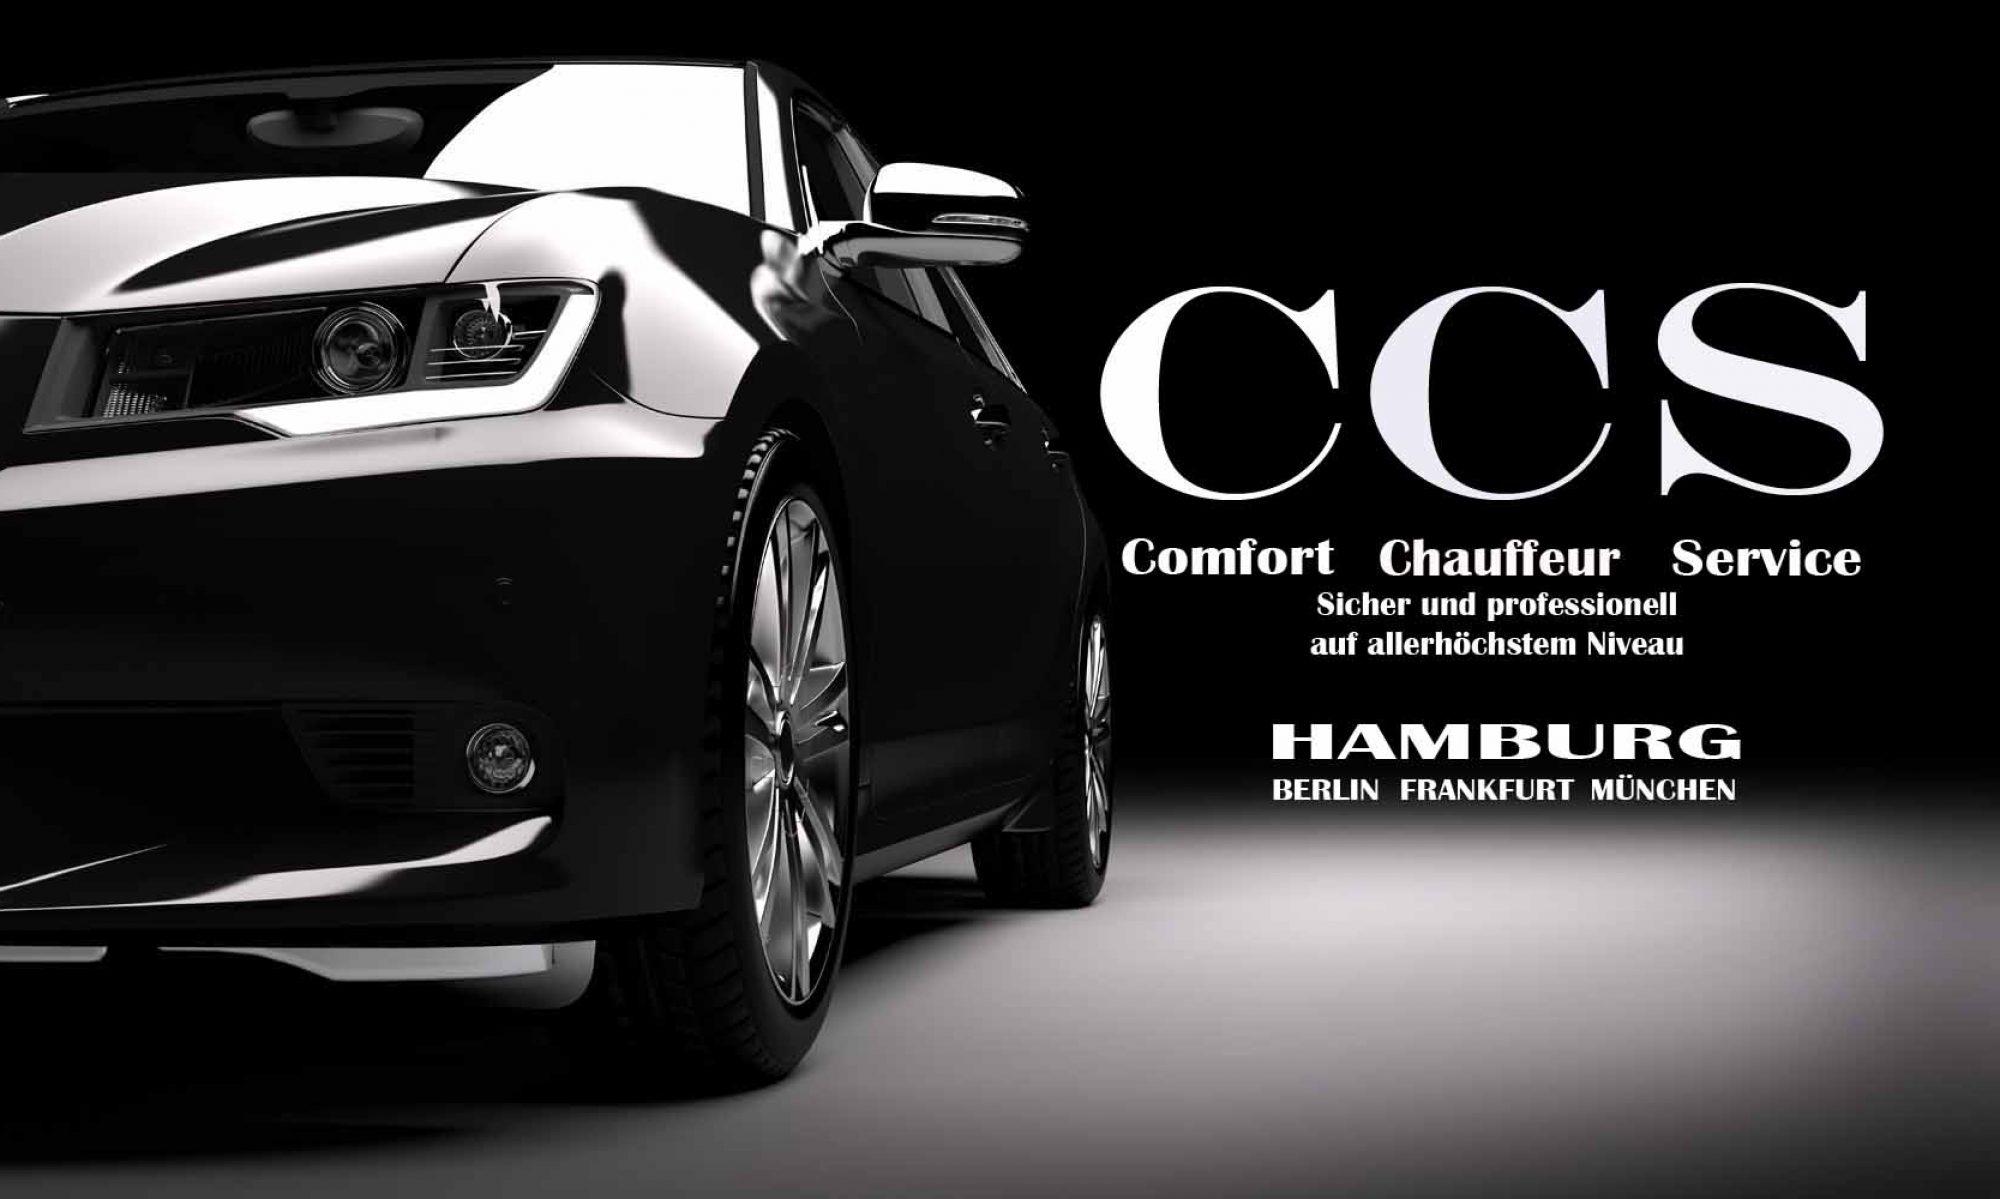 Comfort Chauffeur Service CCS Hamburg